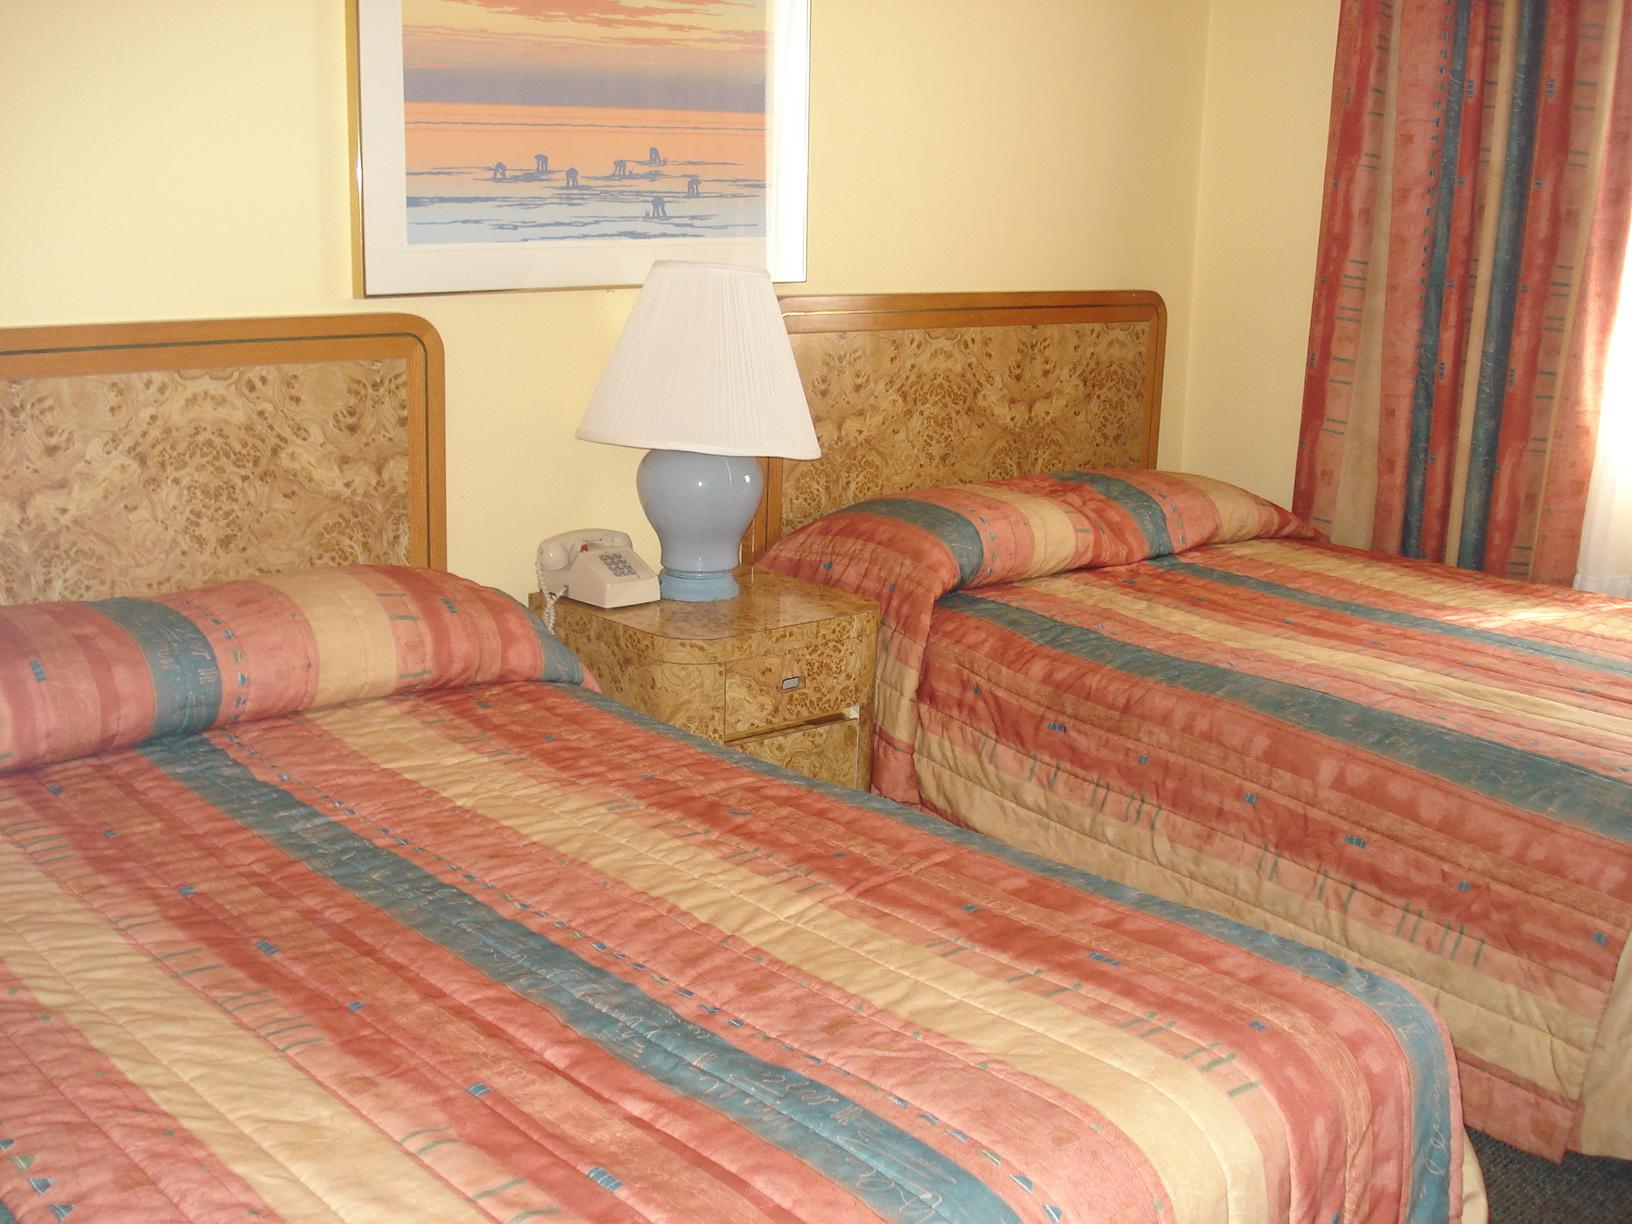 Royal Canadian Resort Motel